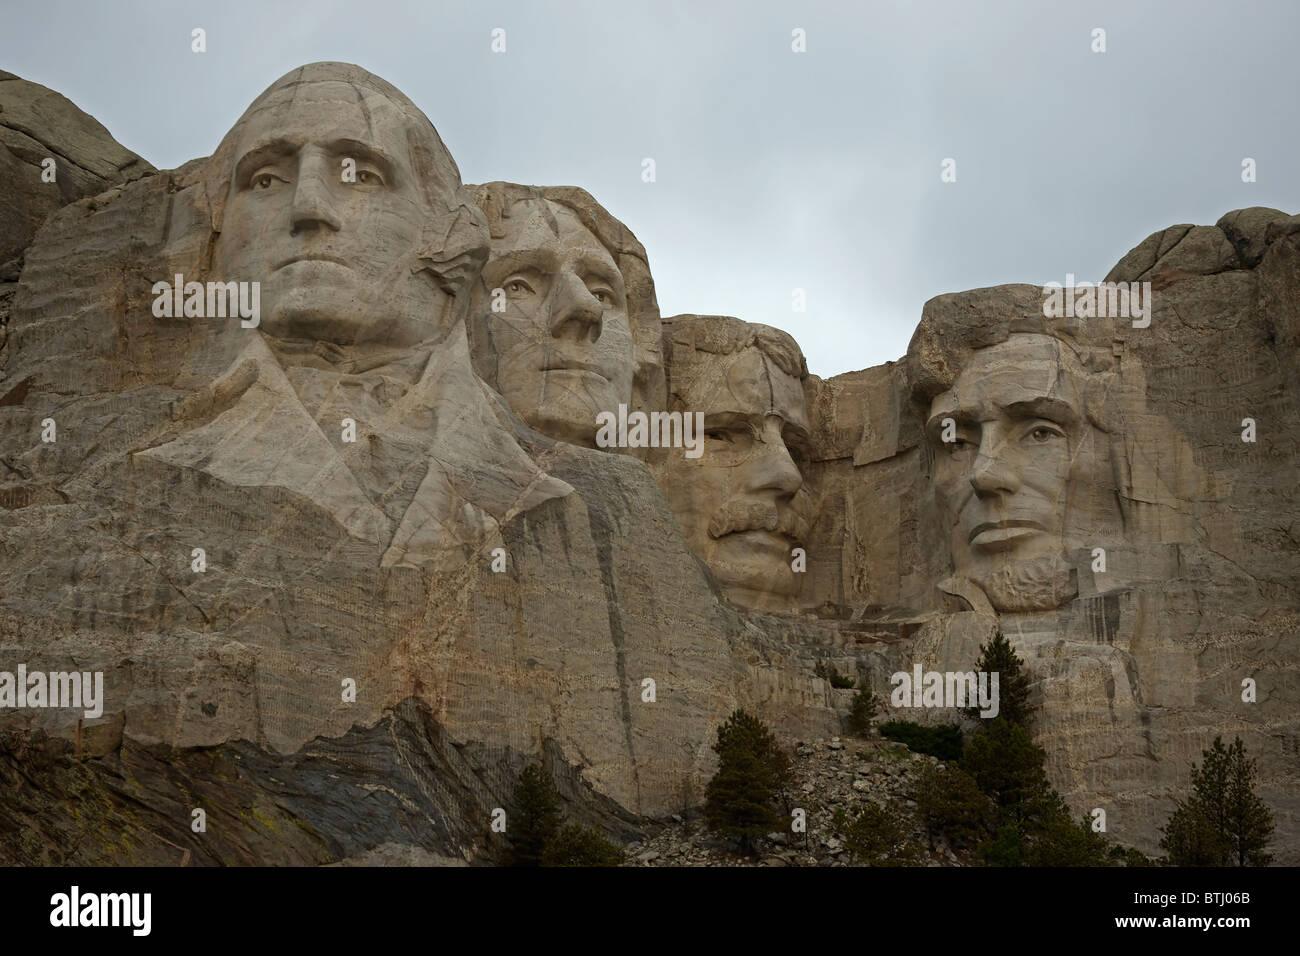 Mount Rushmore National Memorial - South Dakota - Commemorating American Presidents Stock Photo